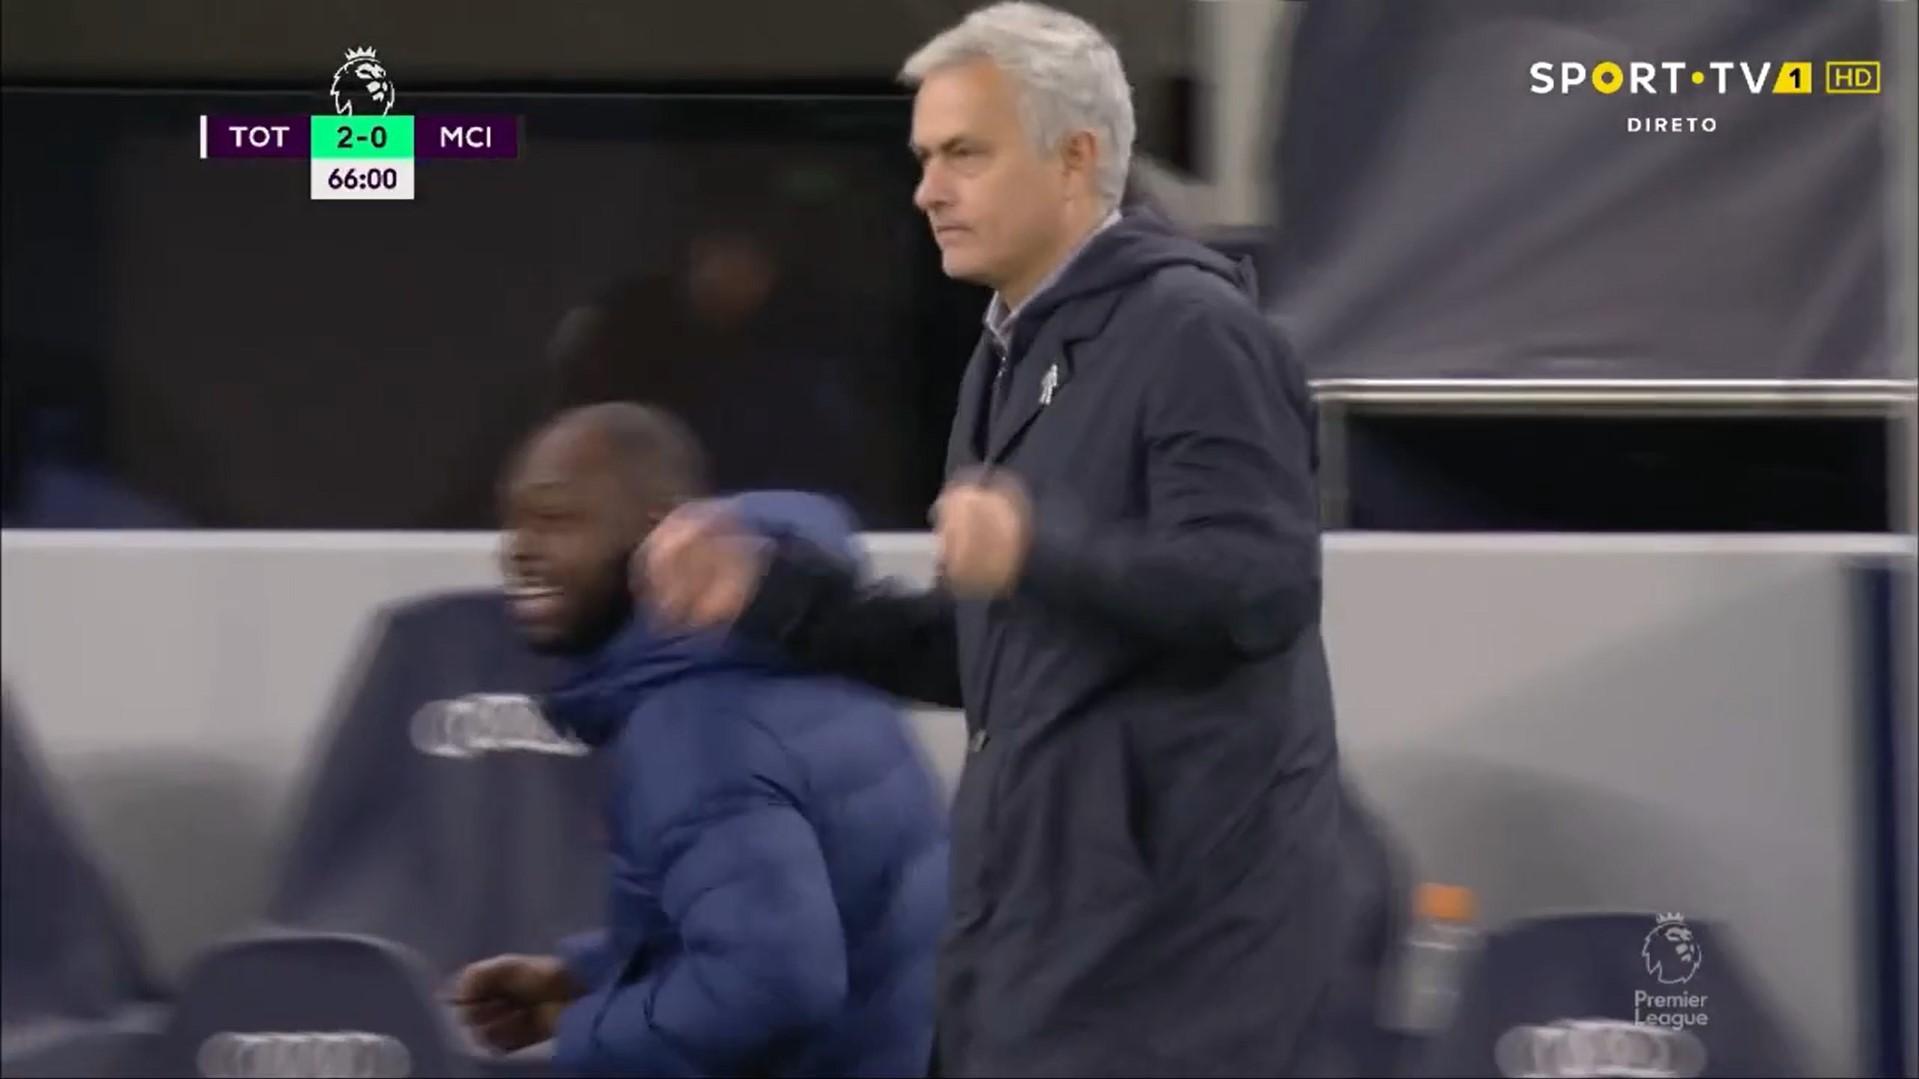 Premier League (9ª Jornada): Resumo Tottenham 2-0 Man. City